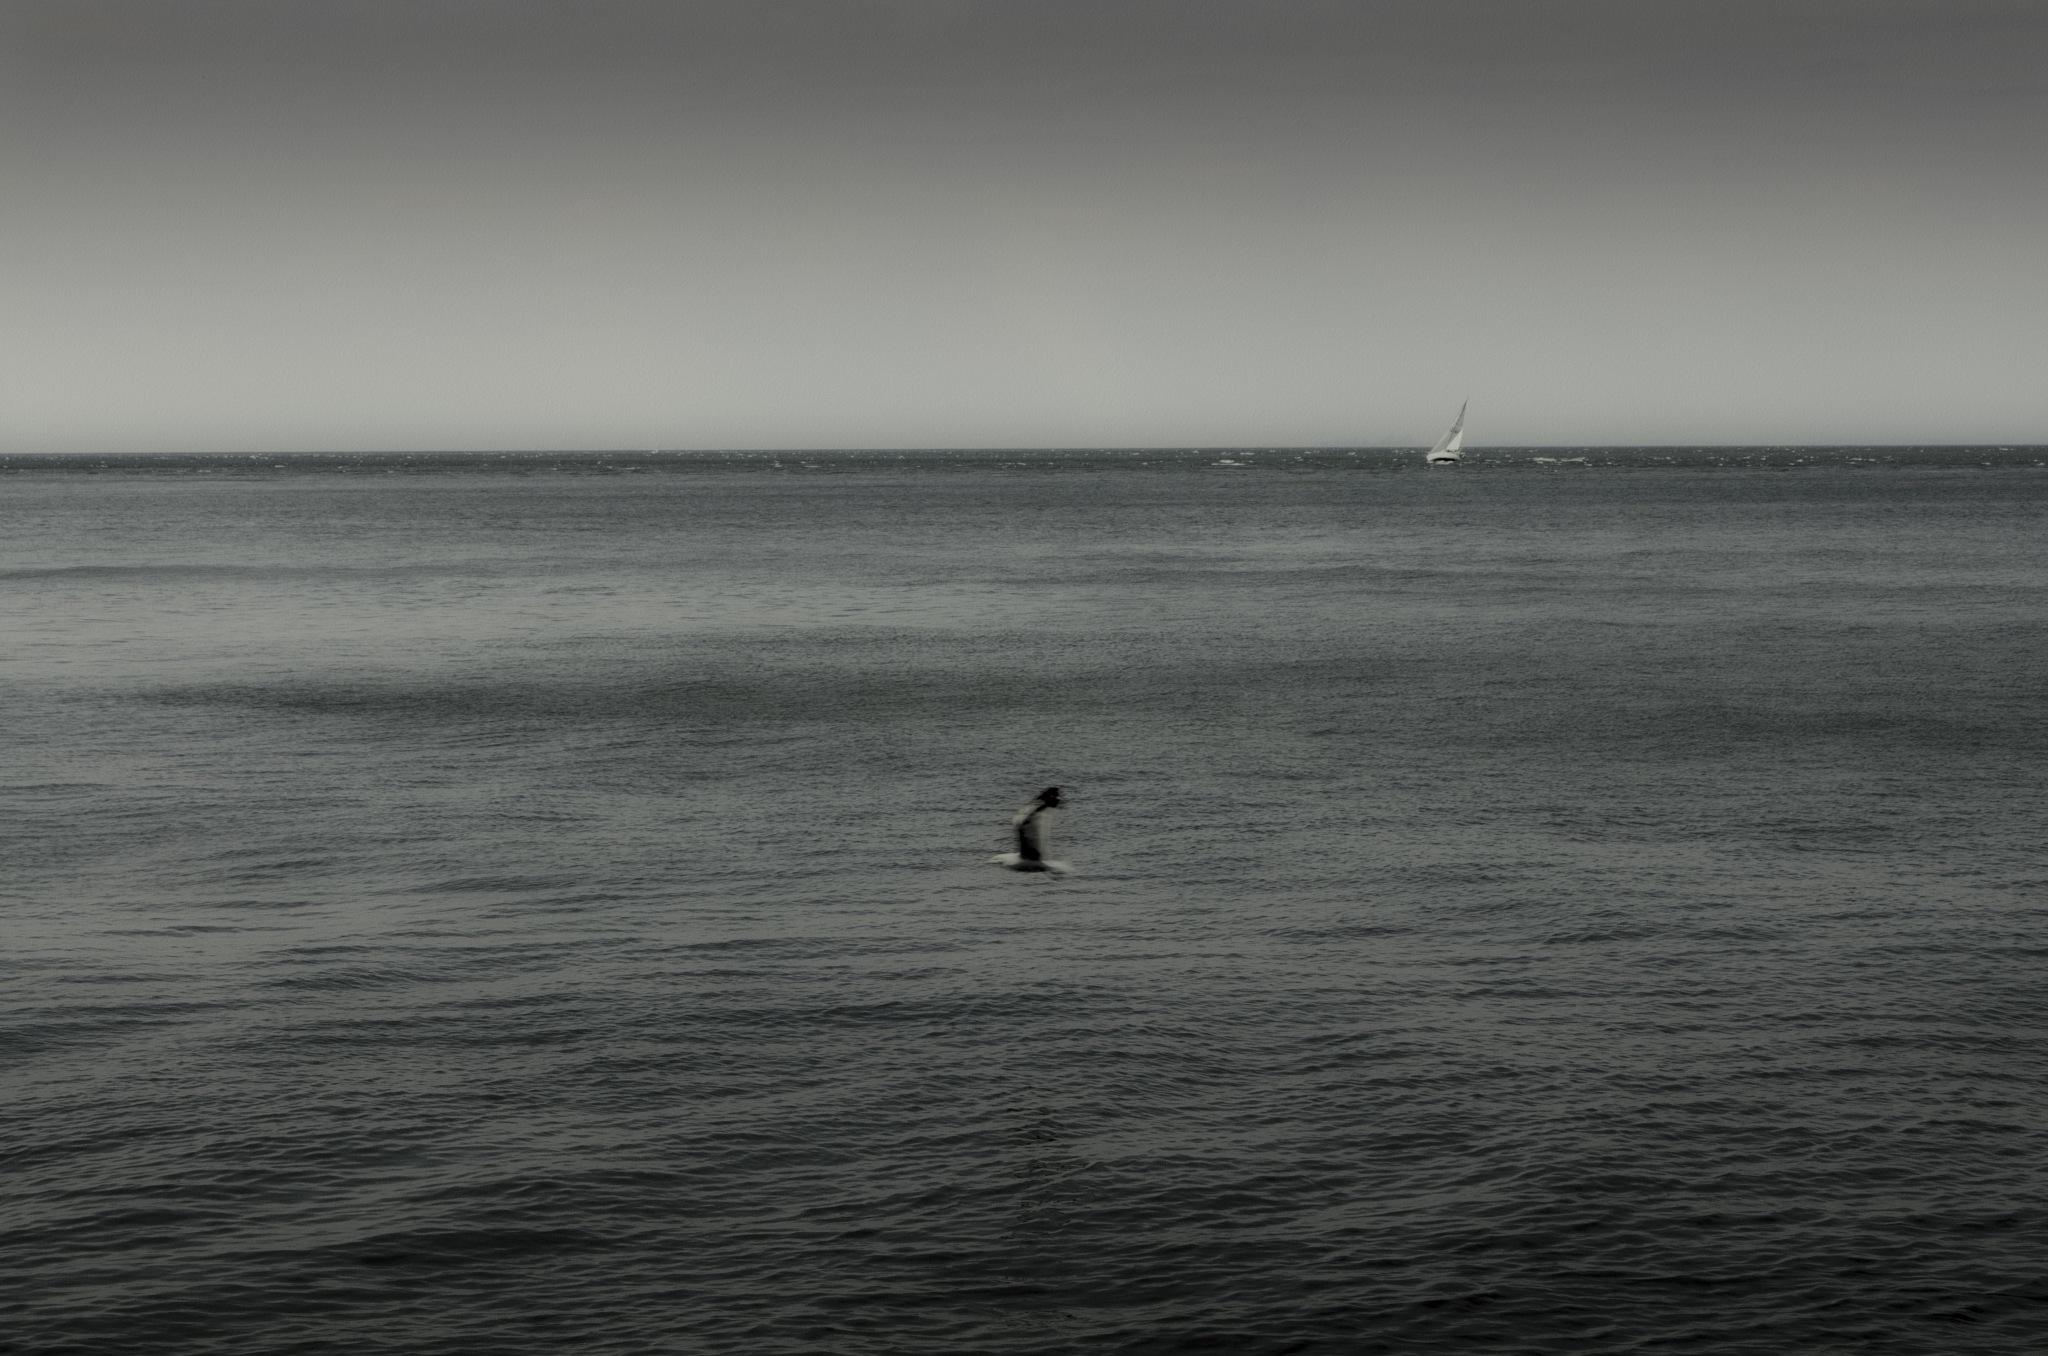 A Seagull's Dream by Graham McArthur